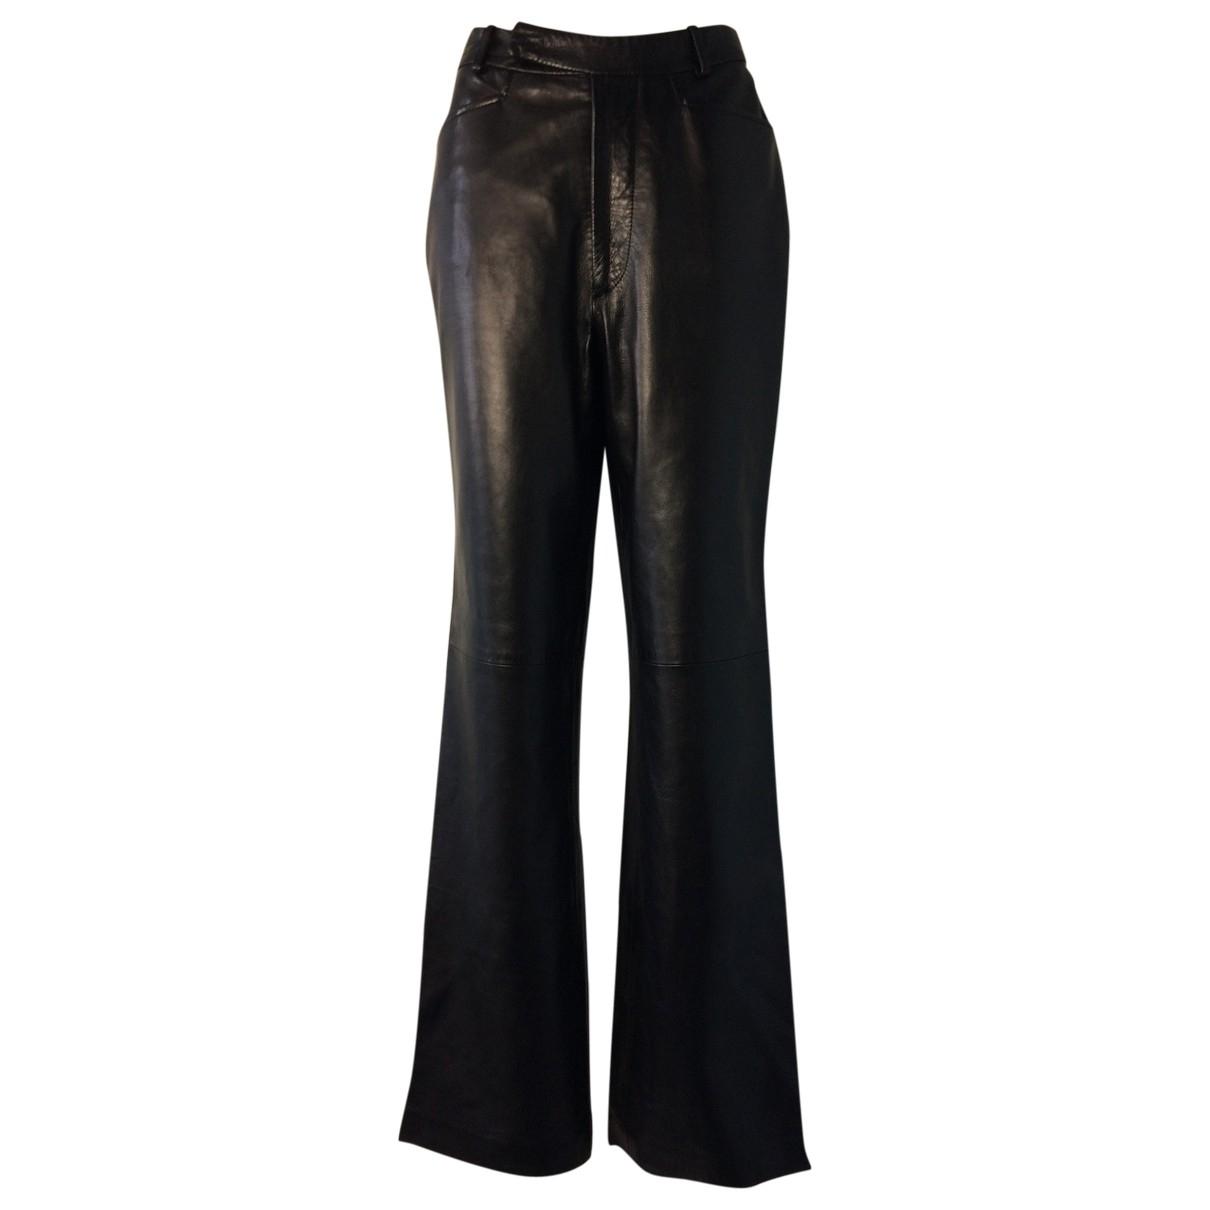 Pantalon de Cuero Gucci